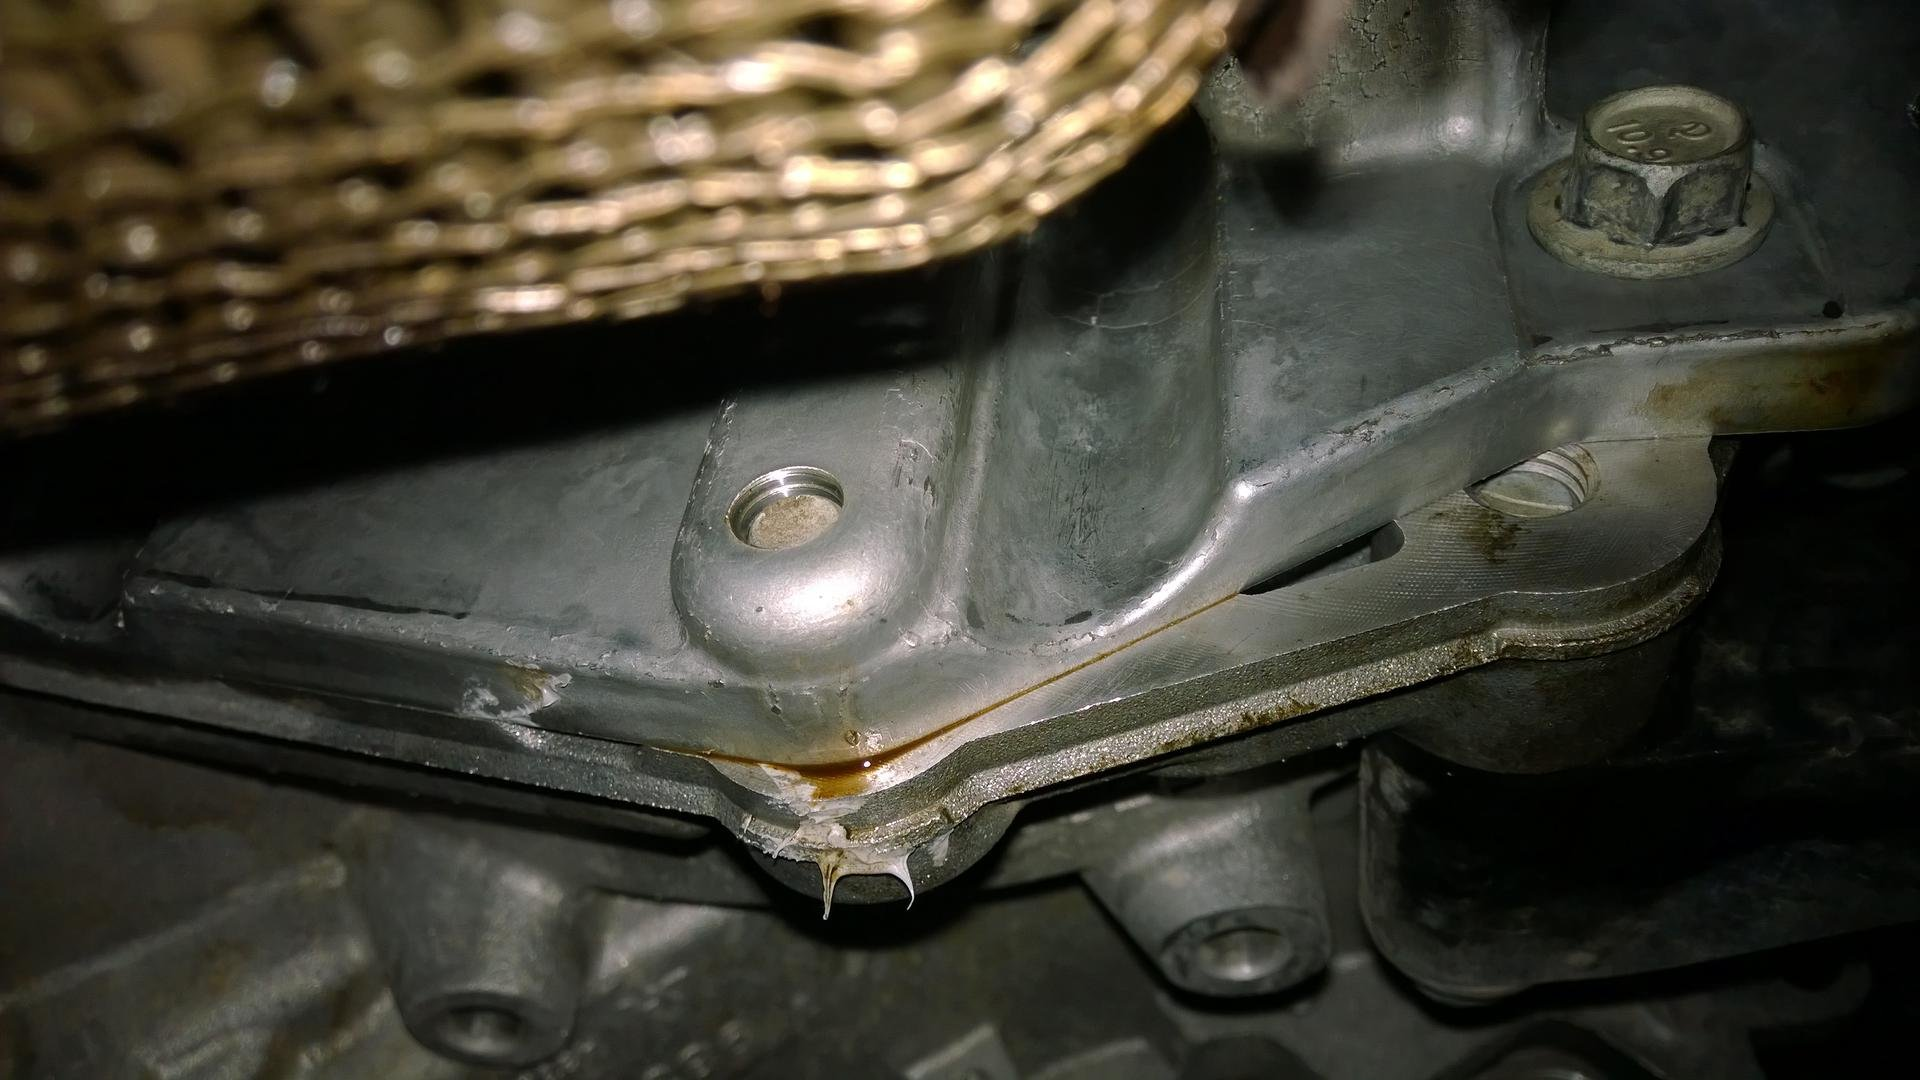 new oil leak  rear main seal or oil pan ? | Chevrolet Cruze Forums